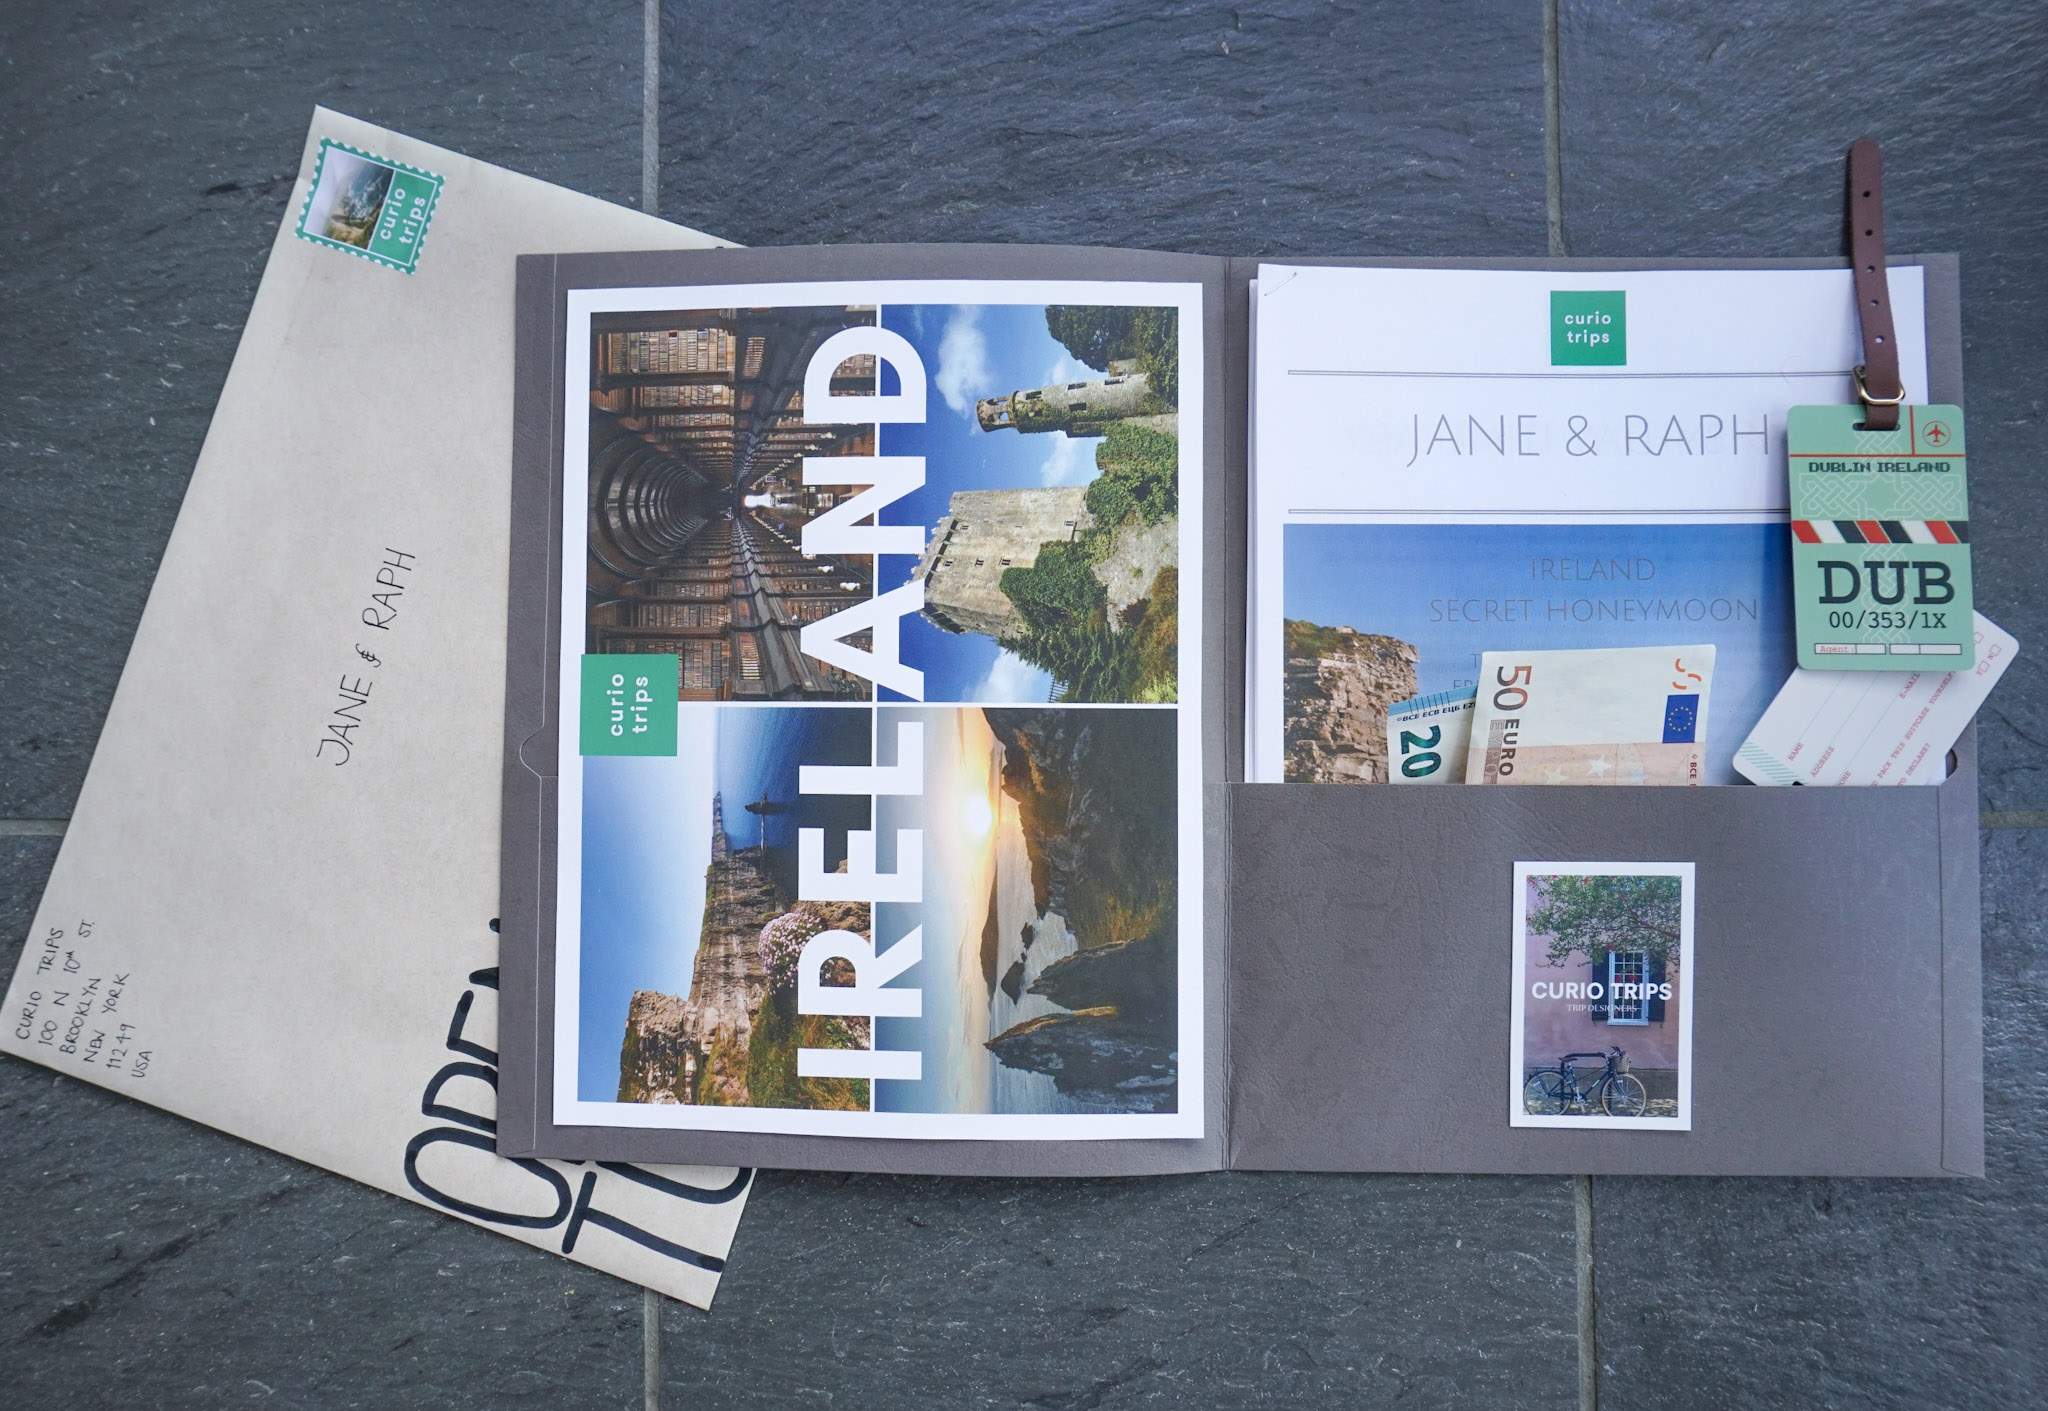 curio.trips.secret.trip.jane.raph.inside.envelope.jpg